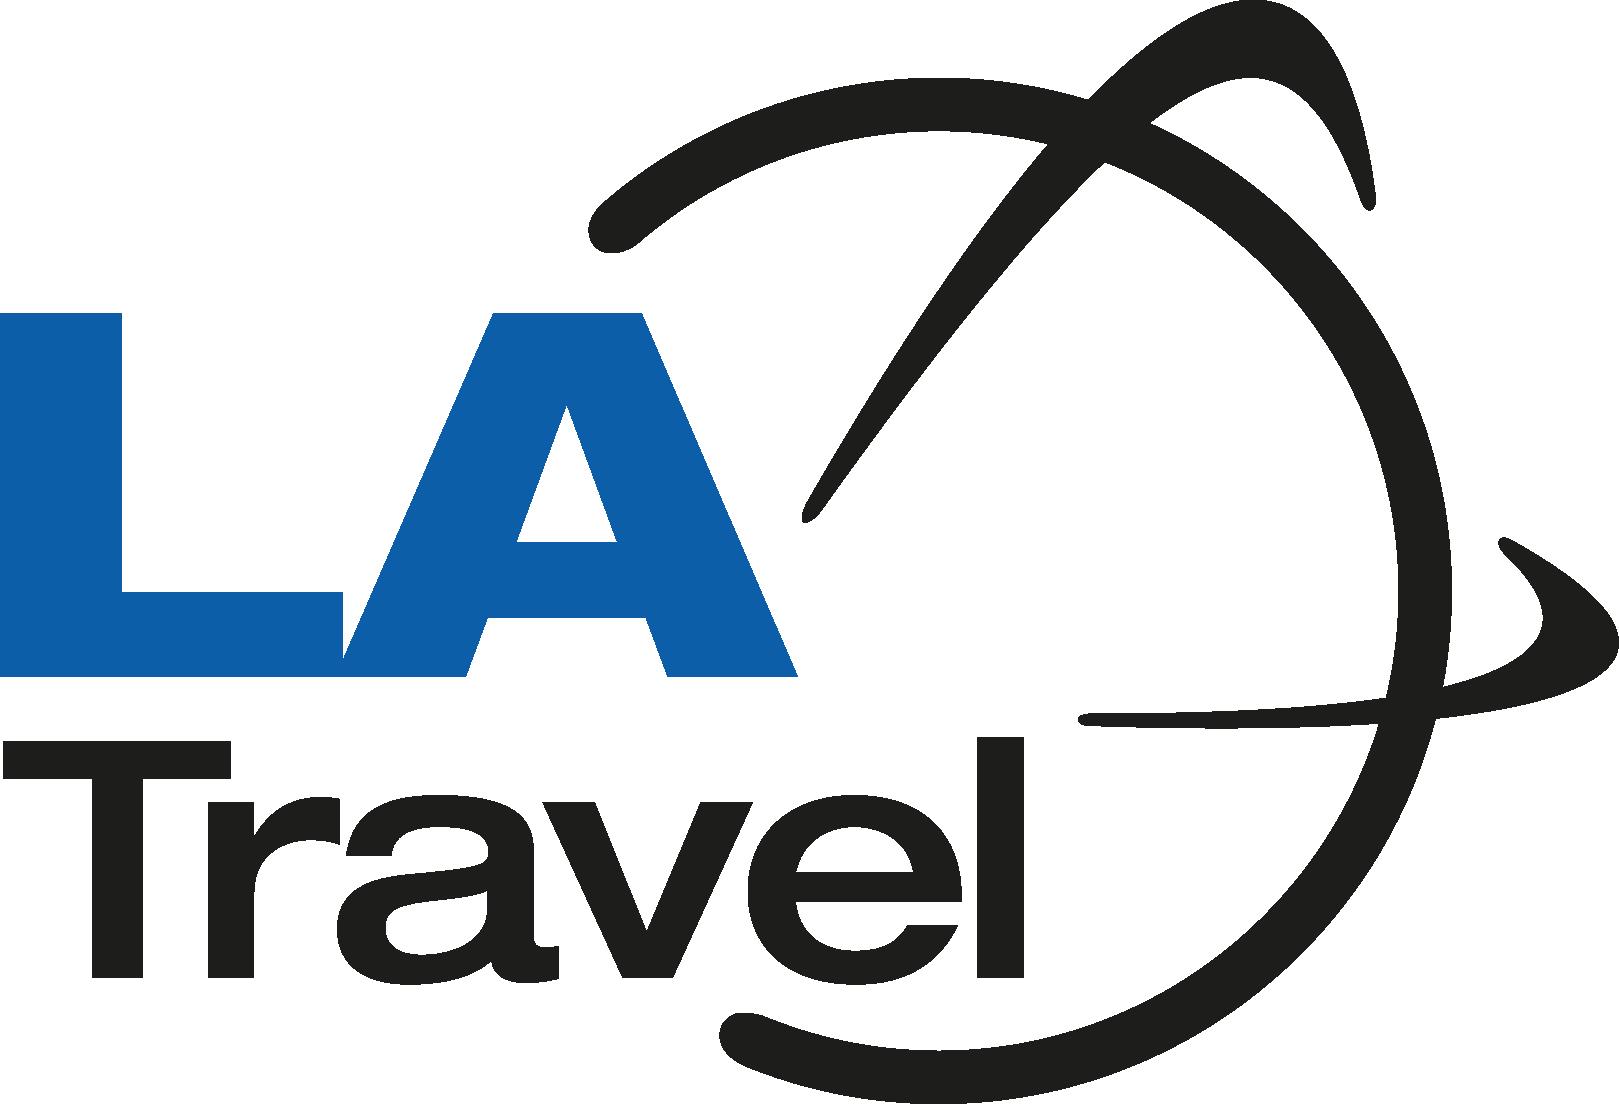 LA Travel